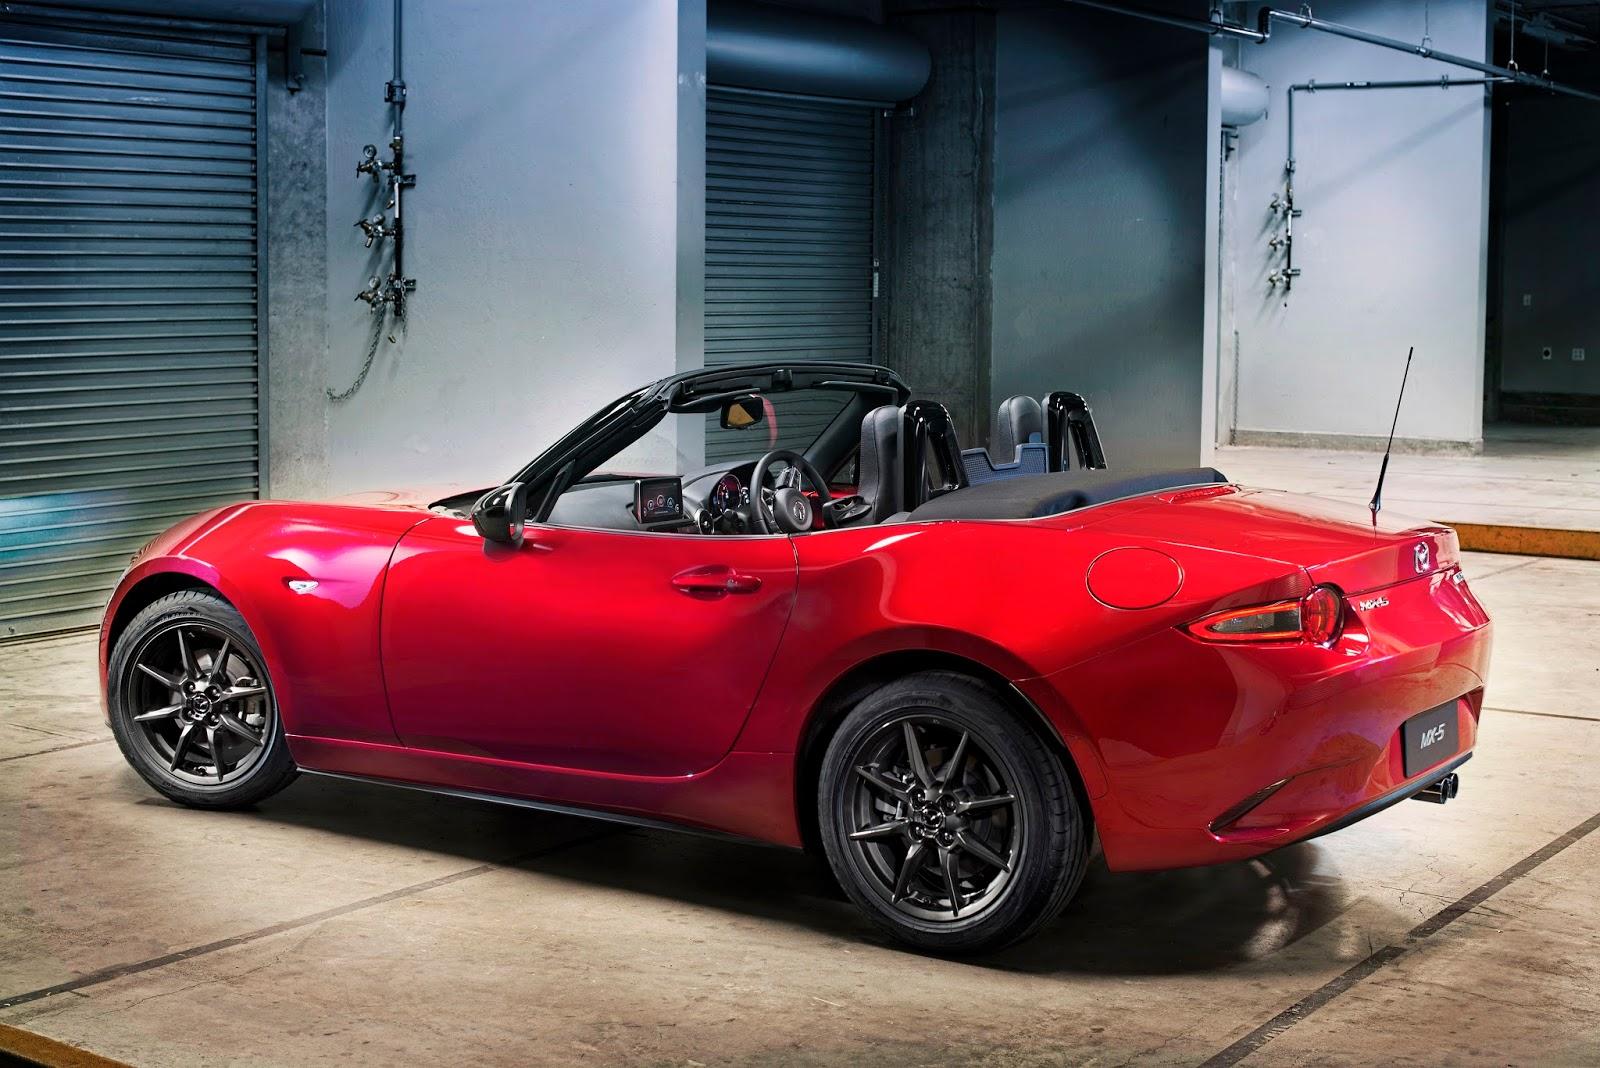 MX5 Εάν η ζωή ειναι ενα ταξίδι, τότε έχει σημασία τι οδηγούμε, λέει η Mazda Driving materrs, Mazda, MAZDA MX5, MX5, videos